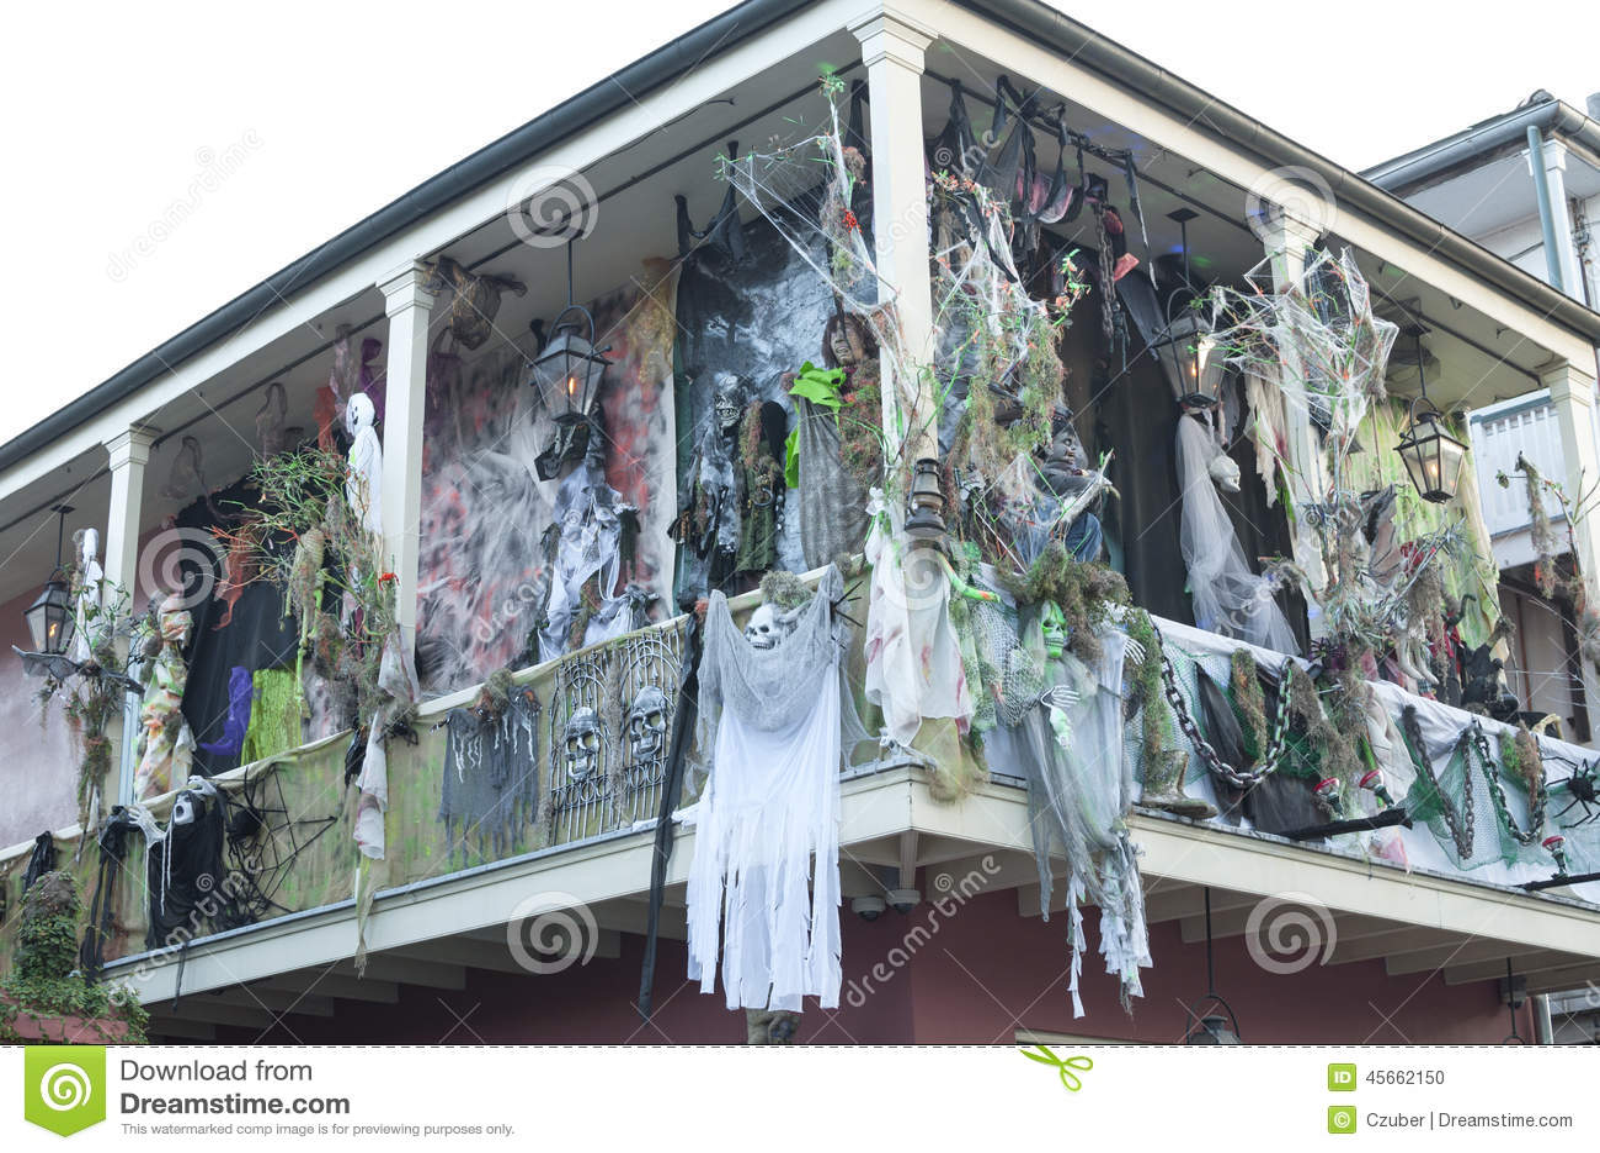 D coration halloween maison usa - Decoration halloween maison hantee ...